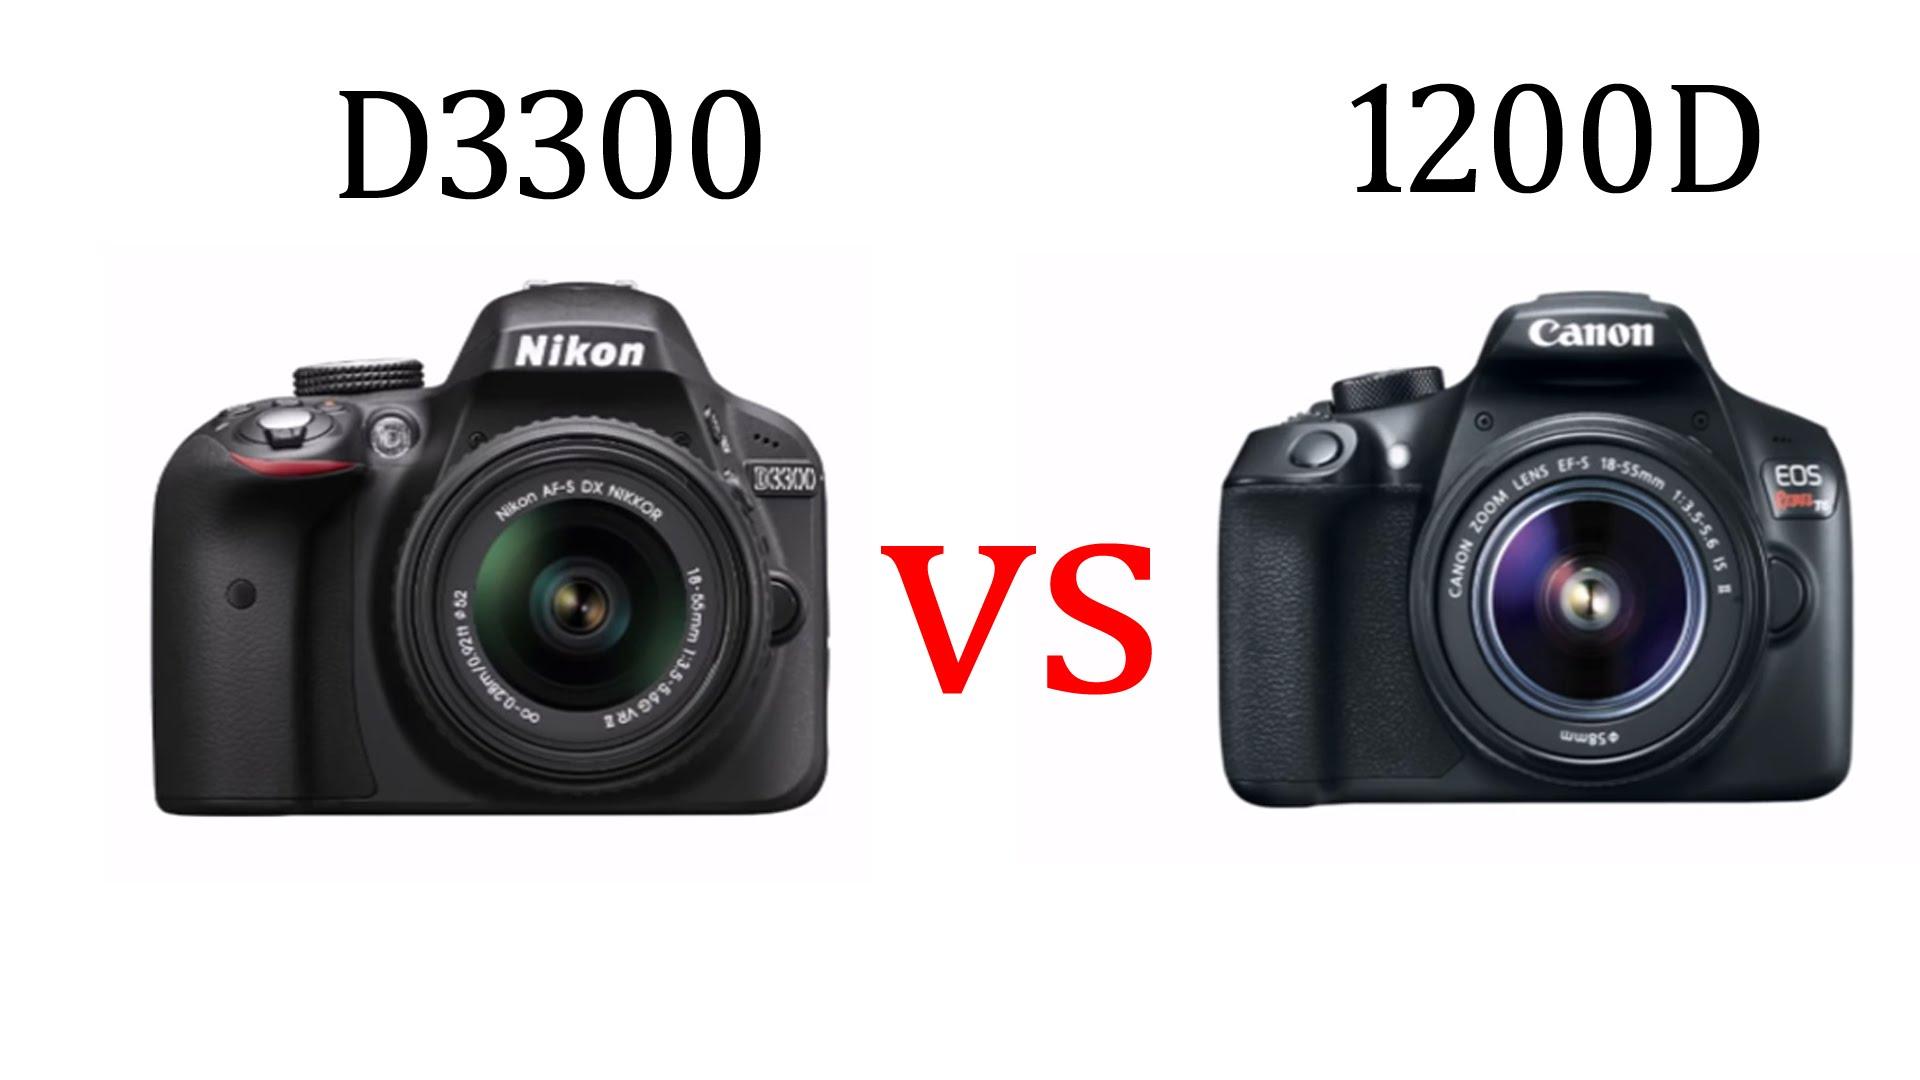 nikon vs canon essay An article of mid-range nikon vs canon detailed comparison series explaining canon 80d's advantages over the nikon d7500  introduction and 80d advantages introduction.